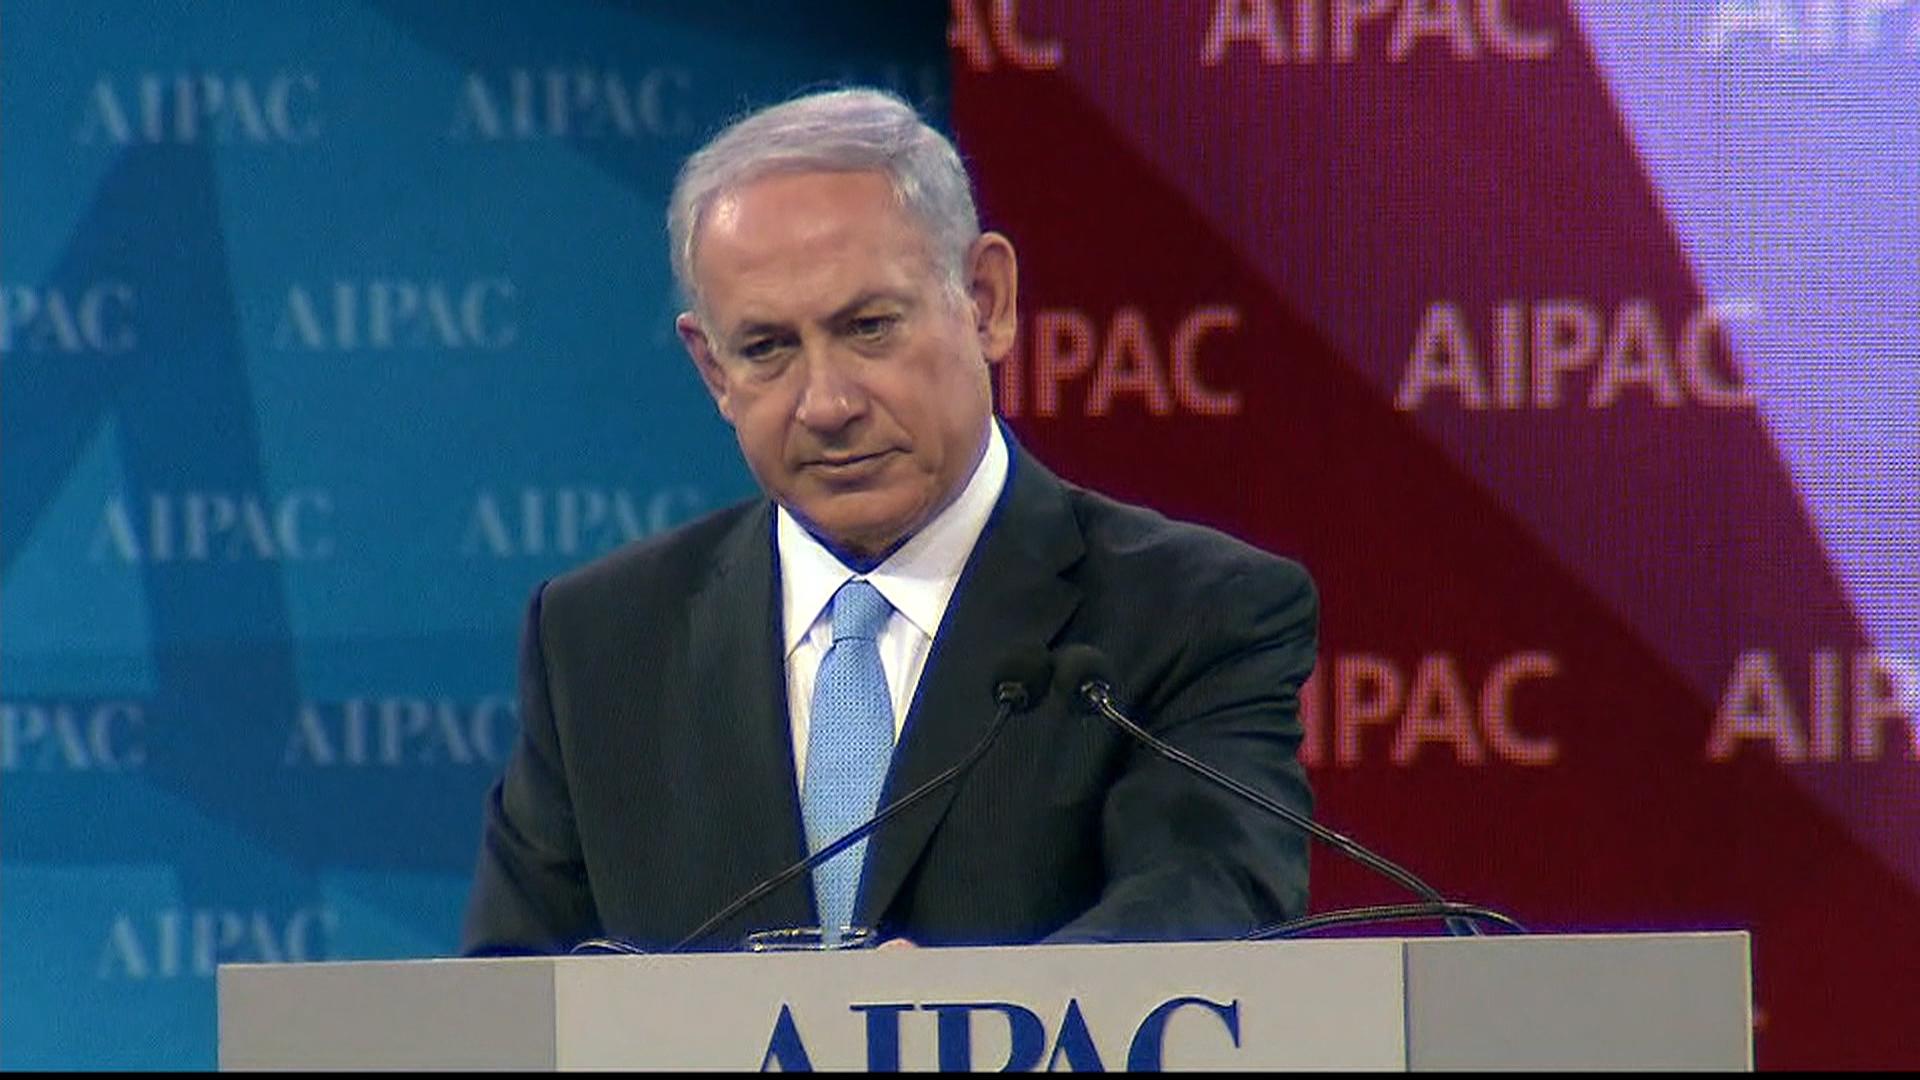 Netanyahu ready for peace deal?